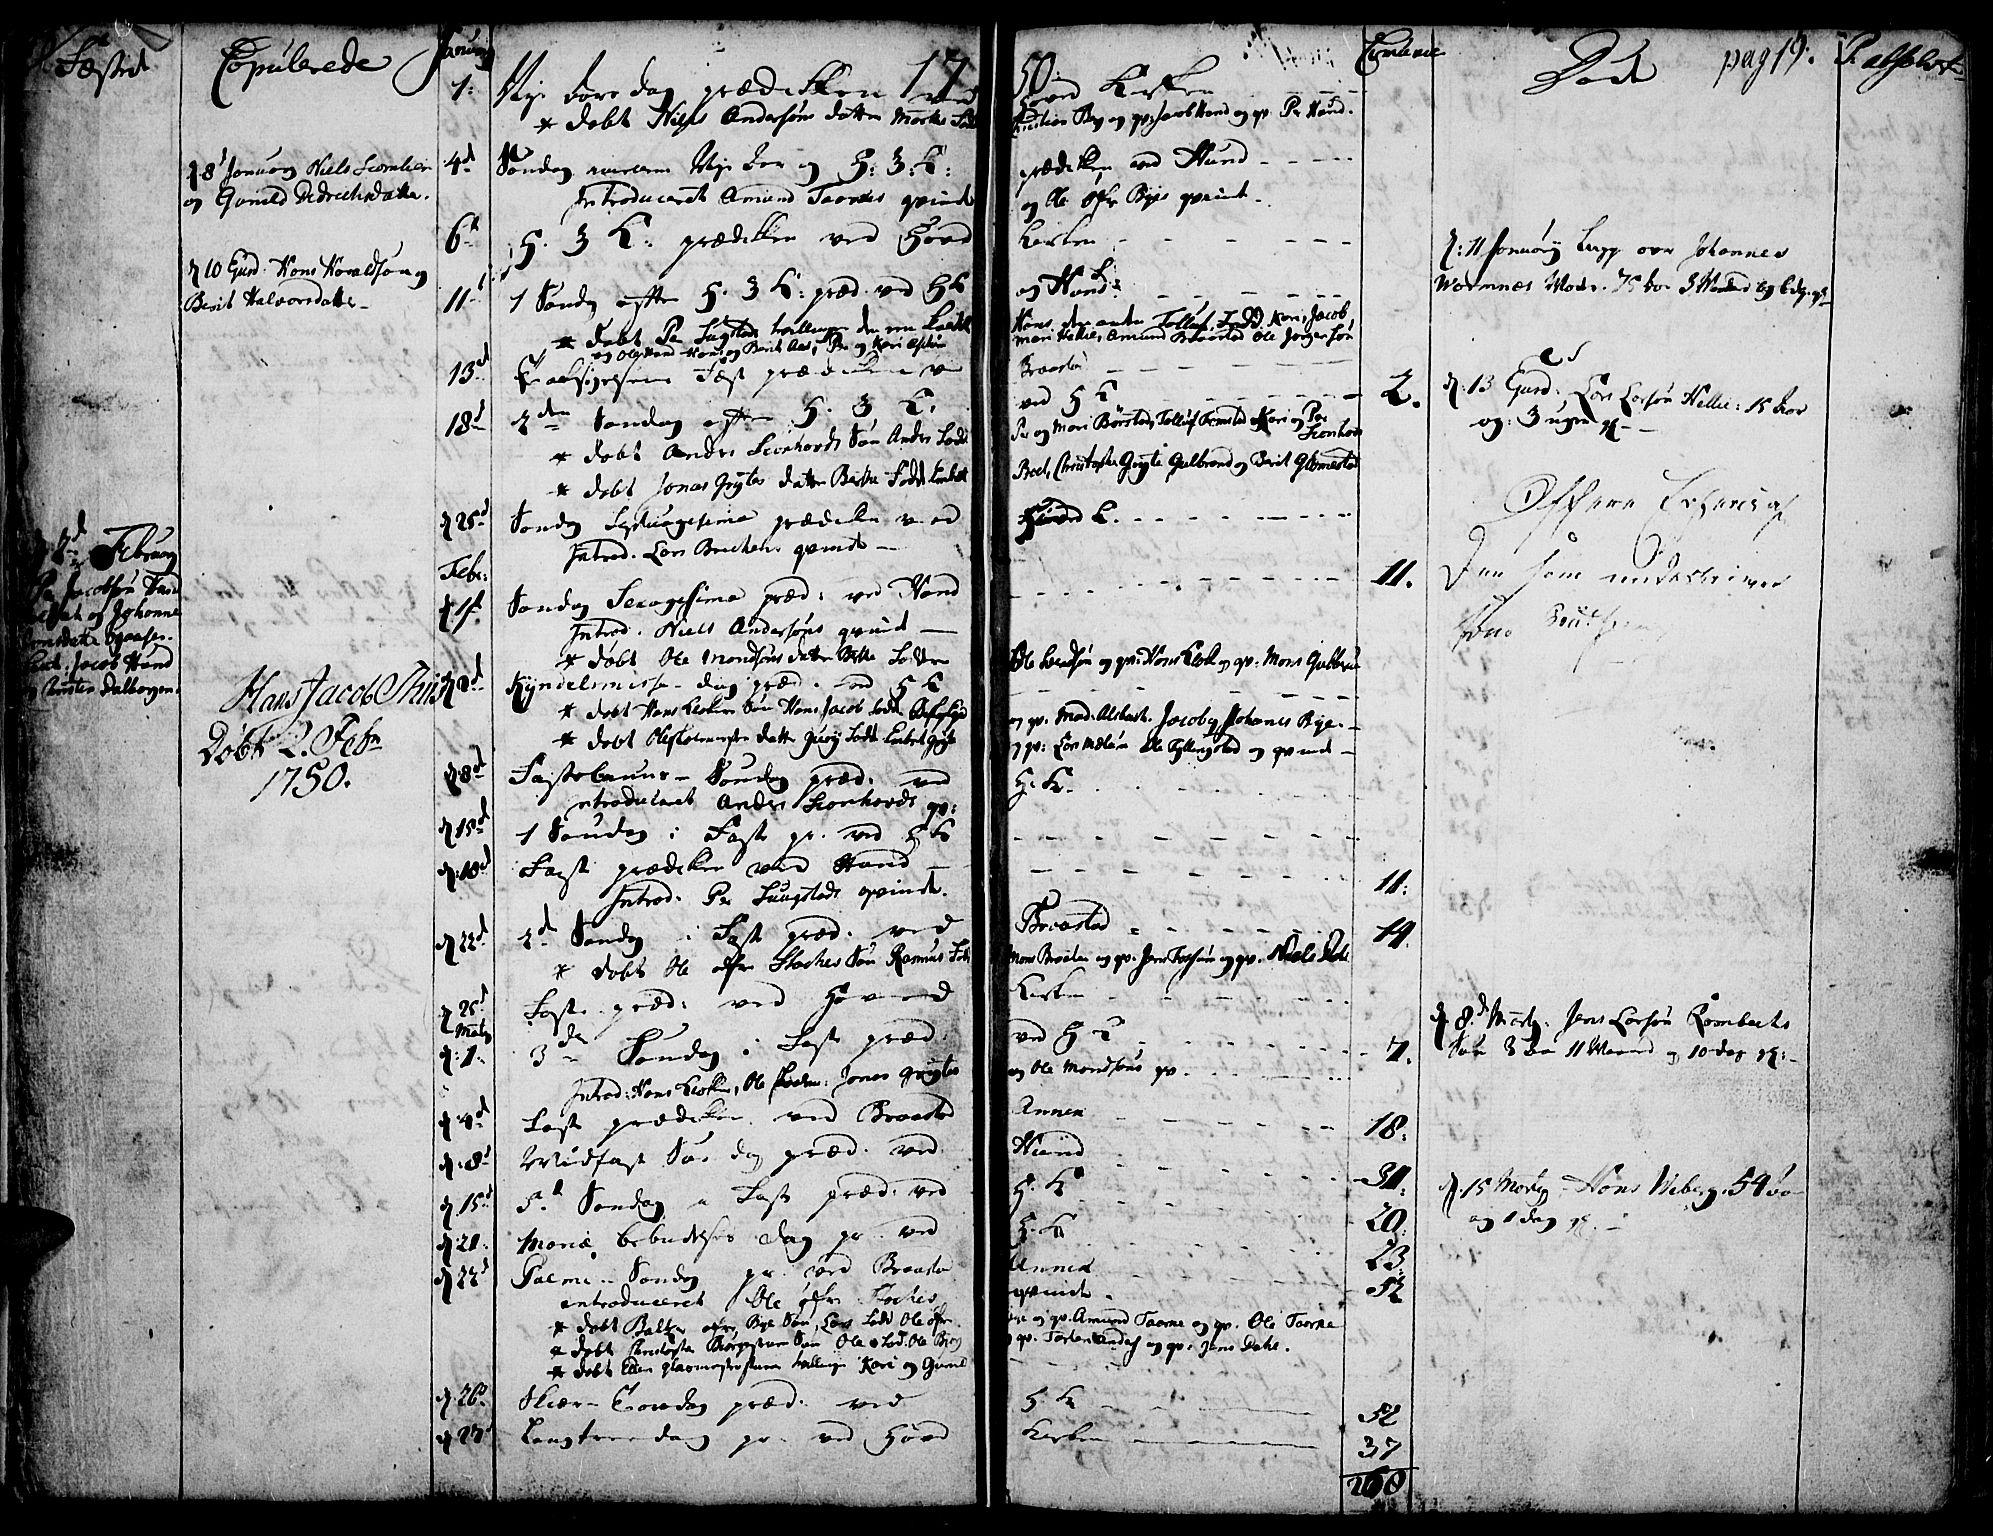 SAH, Vardal prestekontor, H/Ha/Haa/L0002: Ministerialbok nr. 2, 1748-1776, s. 18-19